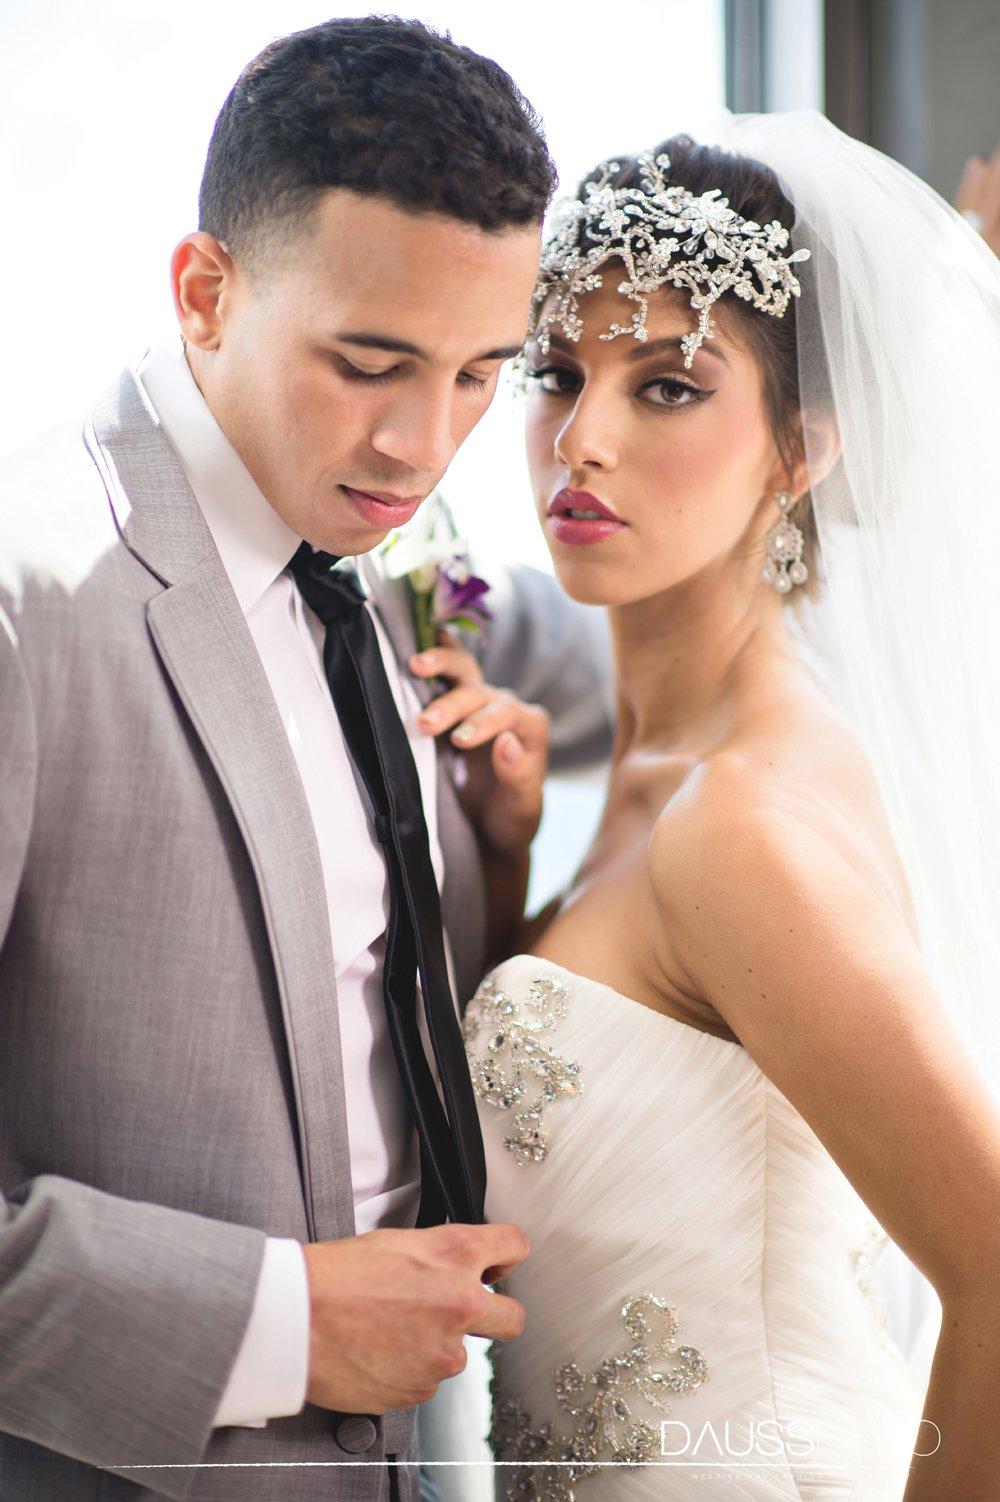 DaussFOTO_20150721_057_Indiana Wedding Photographer.jpg